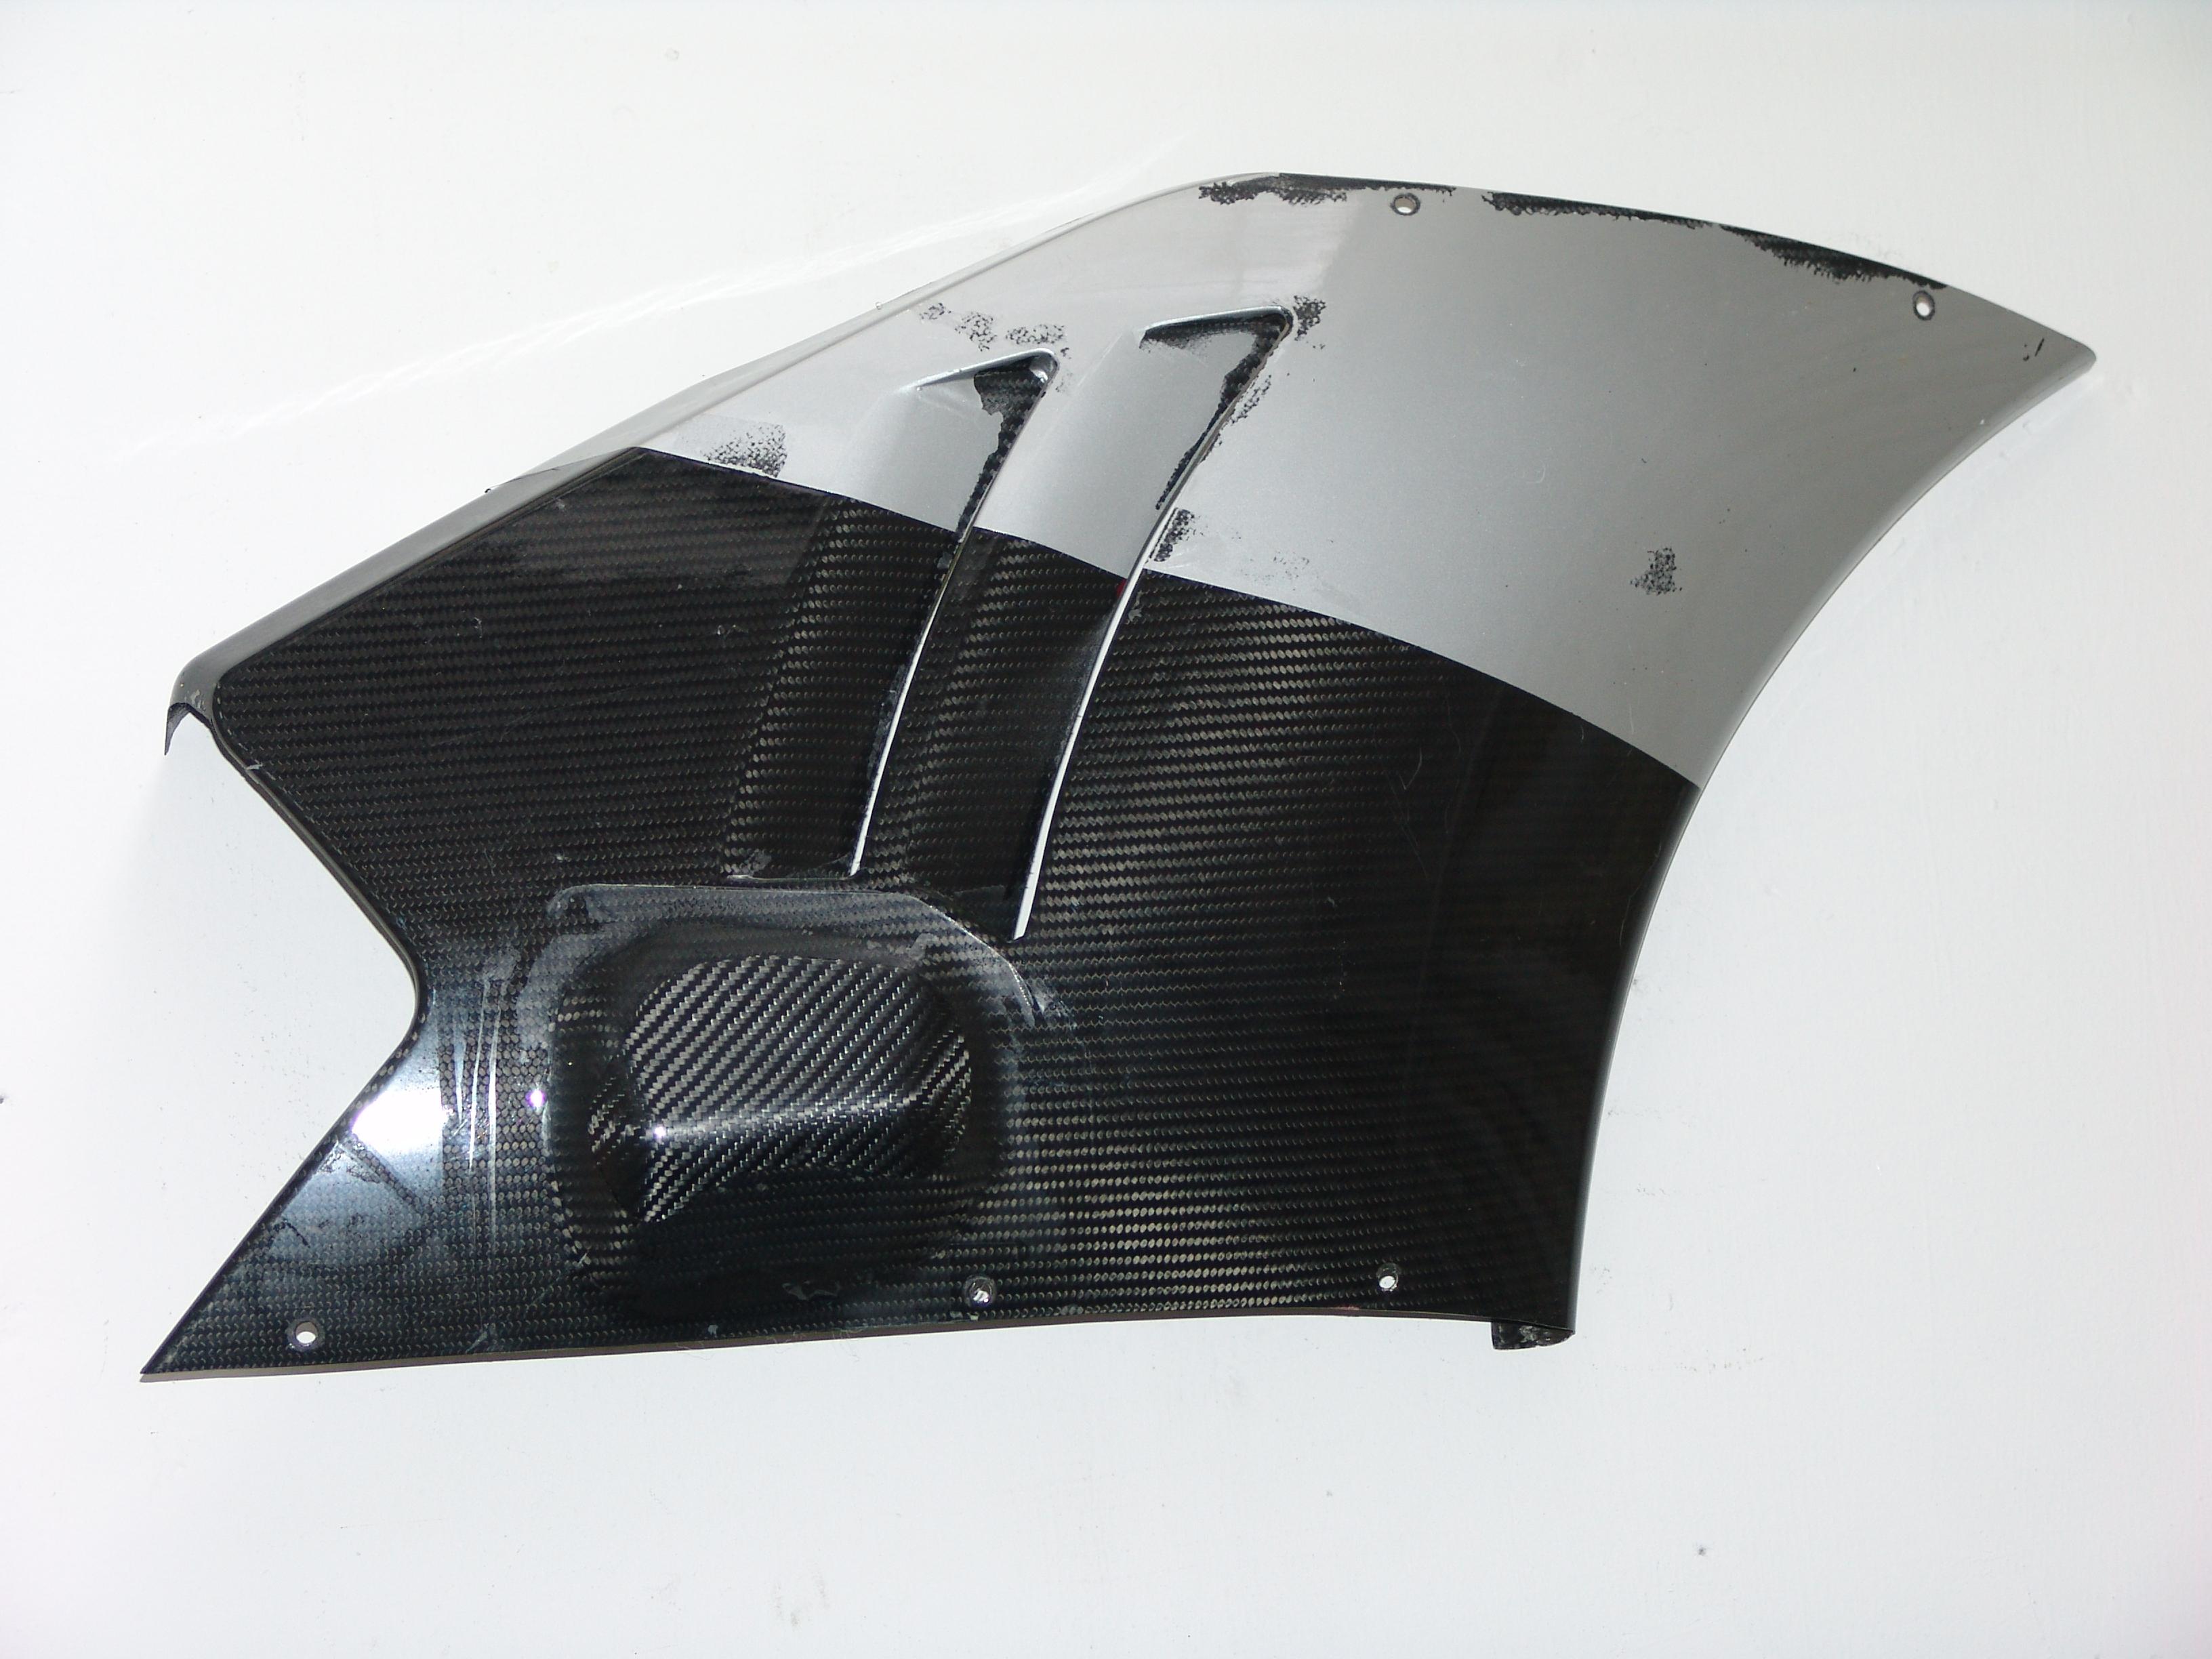 Carenages carbone Kalex Marc VDS Moto 2 (2)